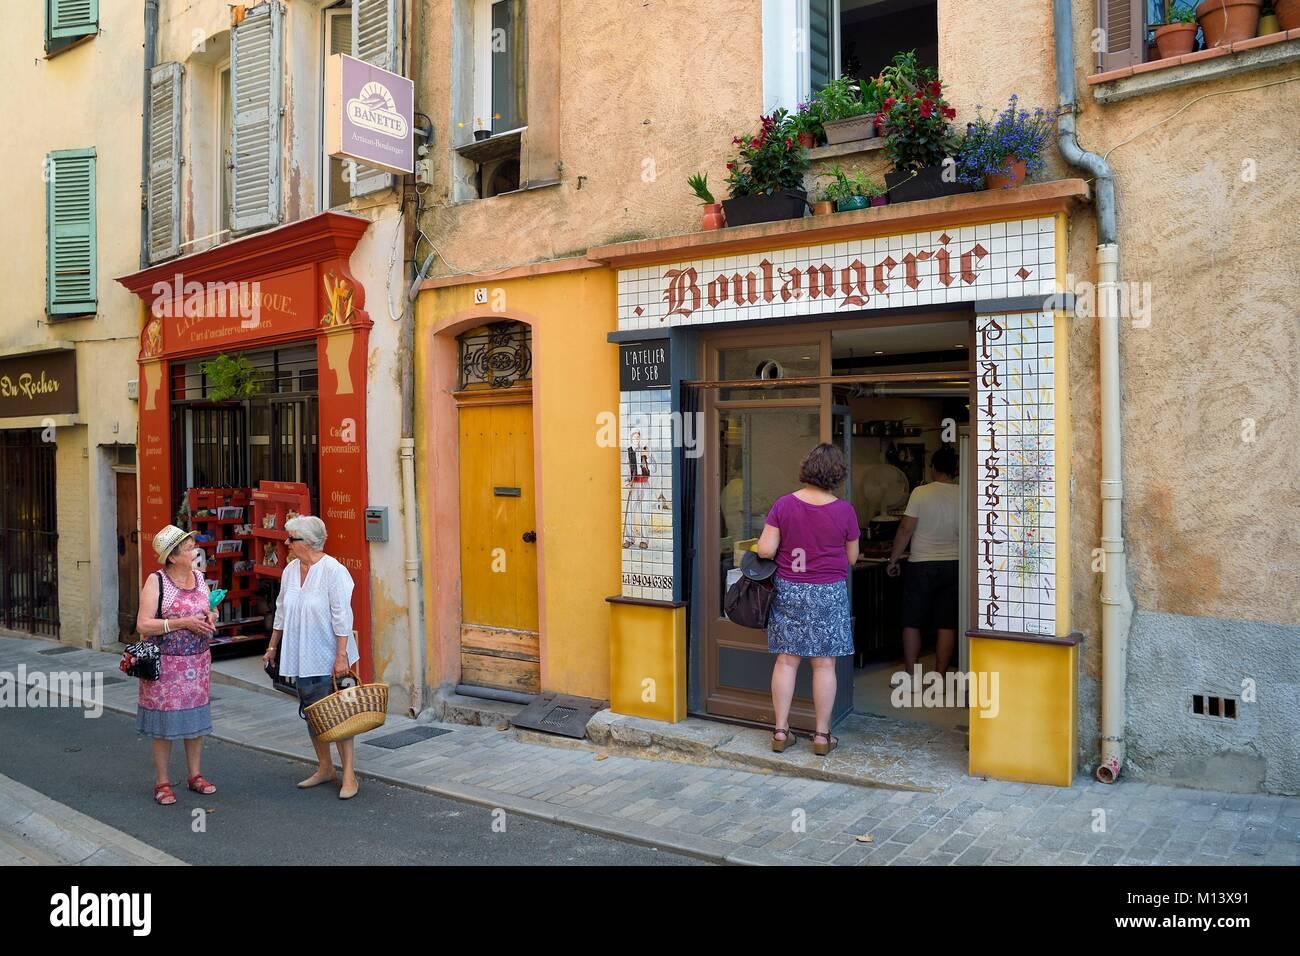 France, Var, Provence Verte, Cotignac, bakery Stock Photo